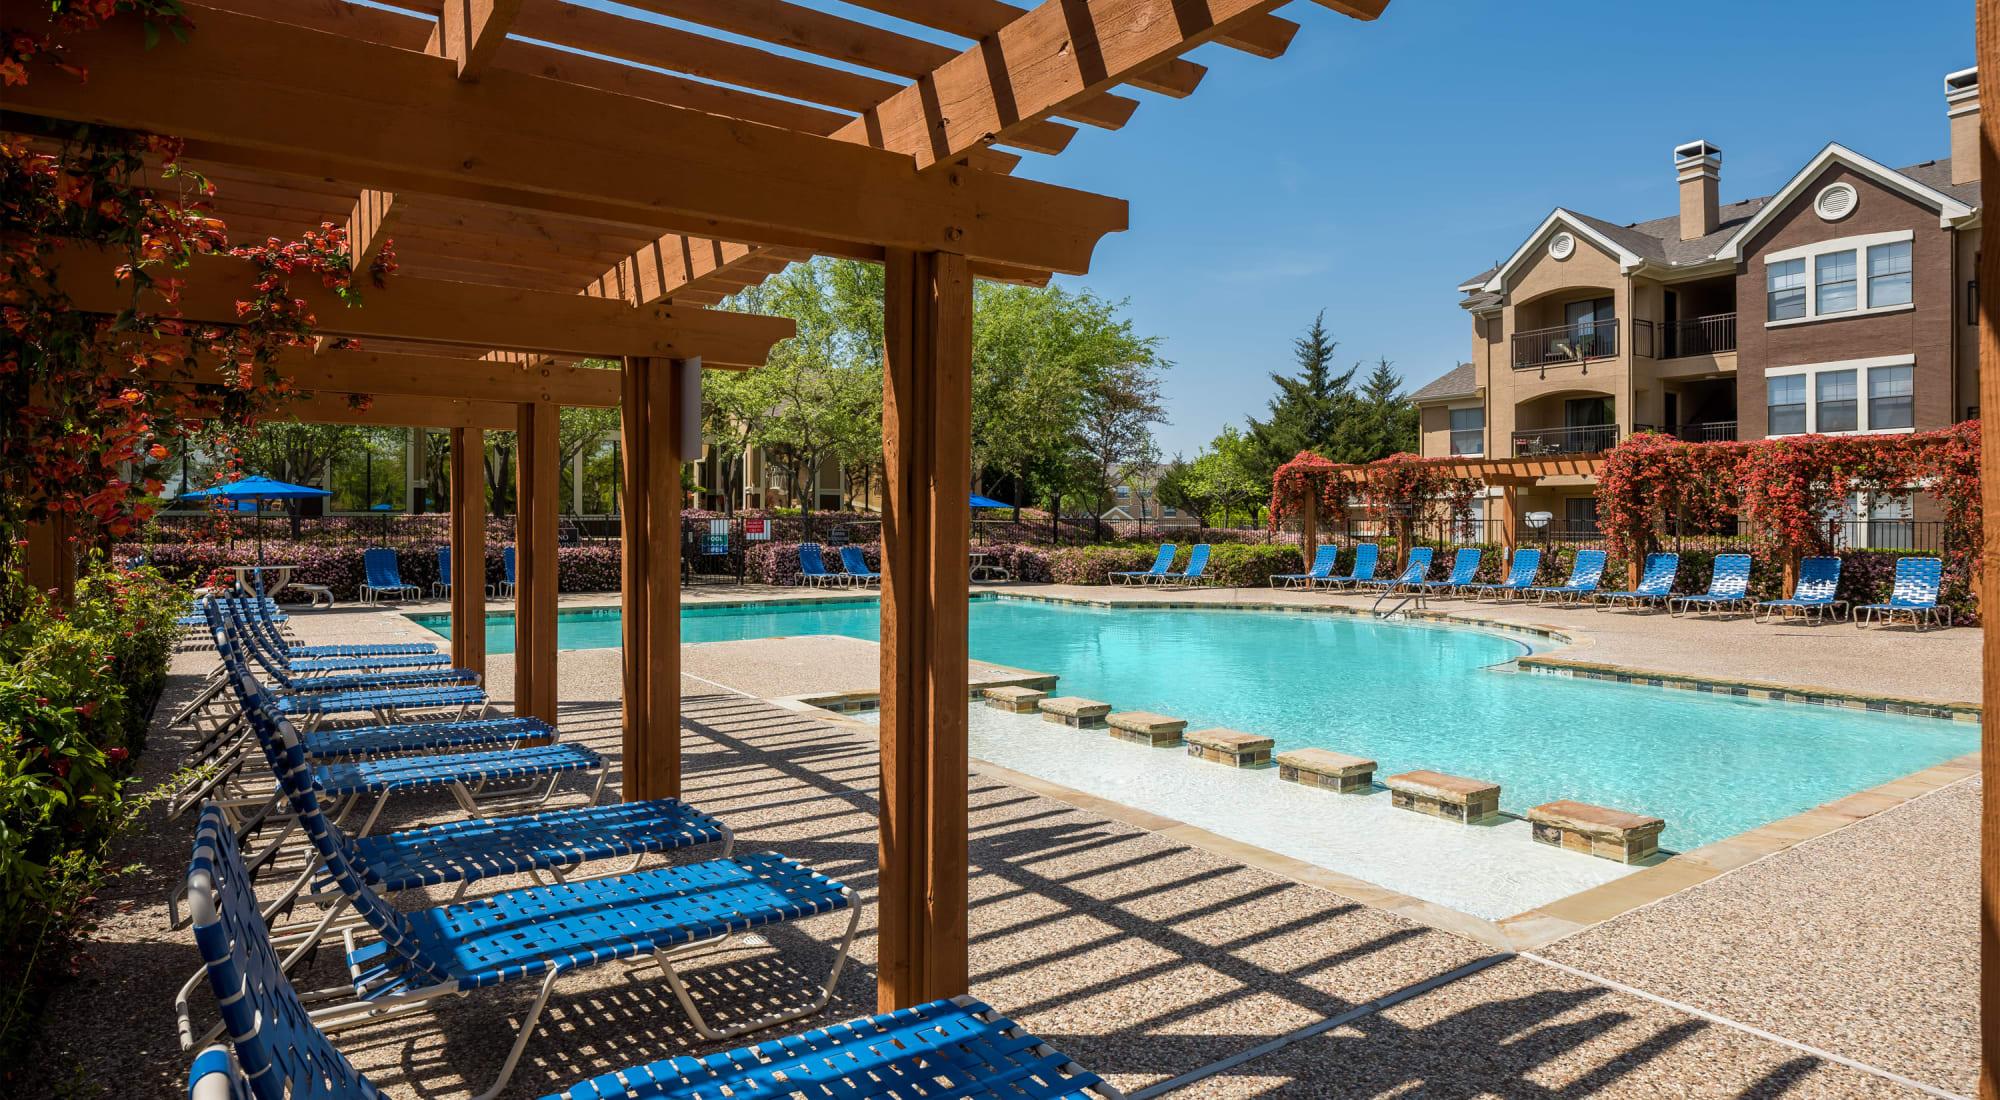 Contact us at Arbrook Park Apartment Homes in Arlington, Texas